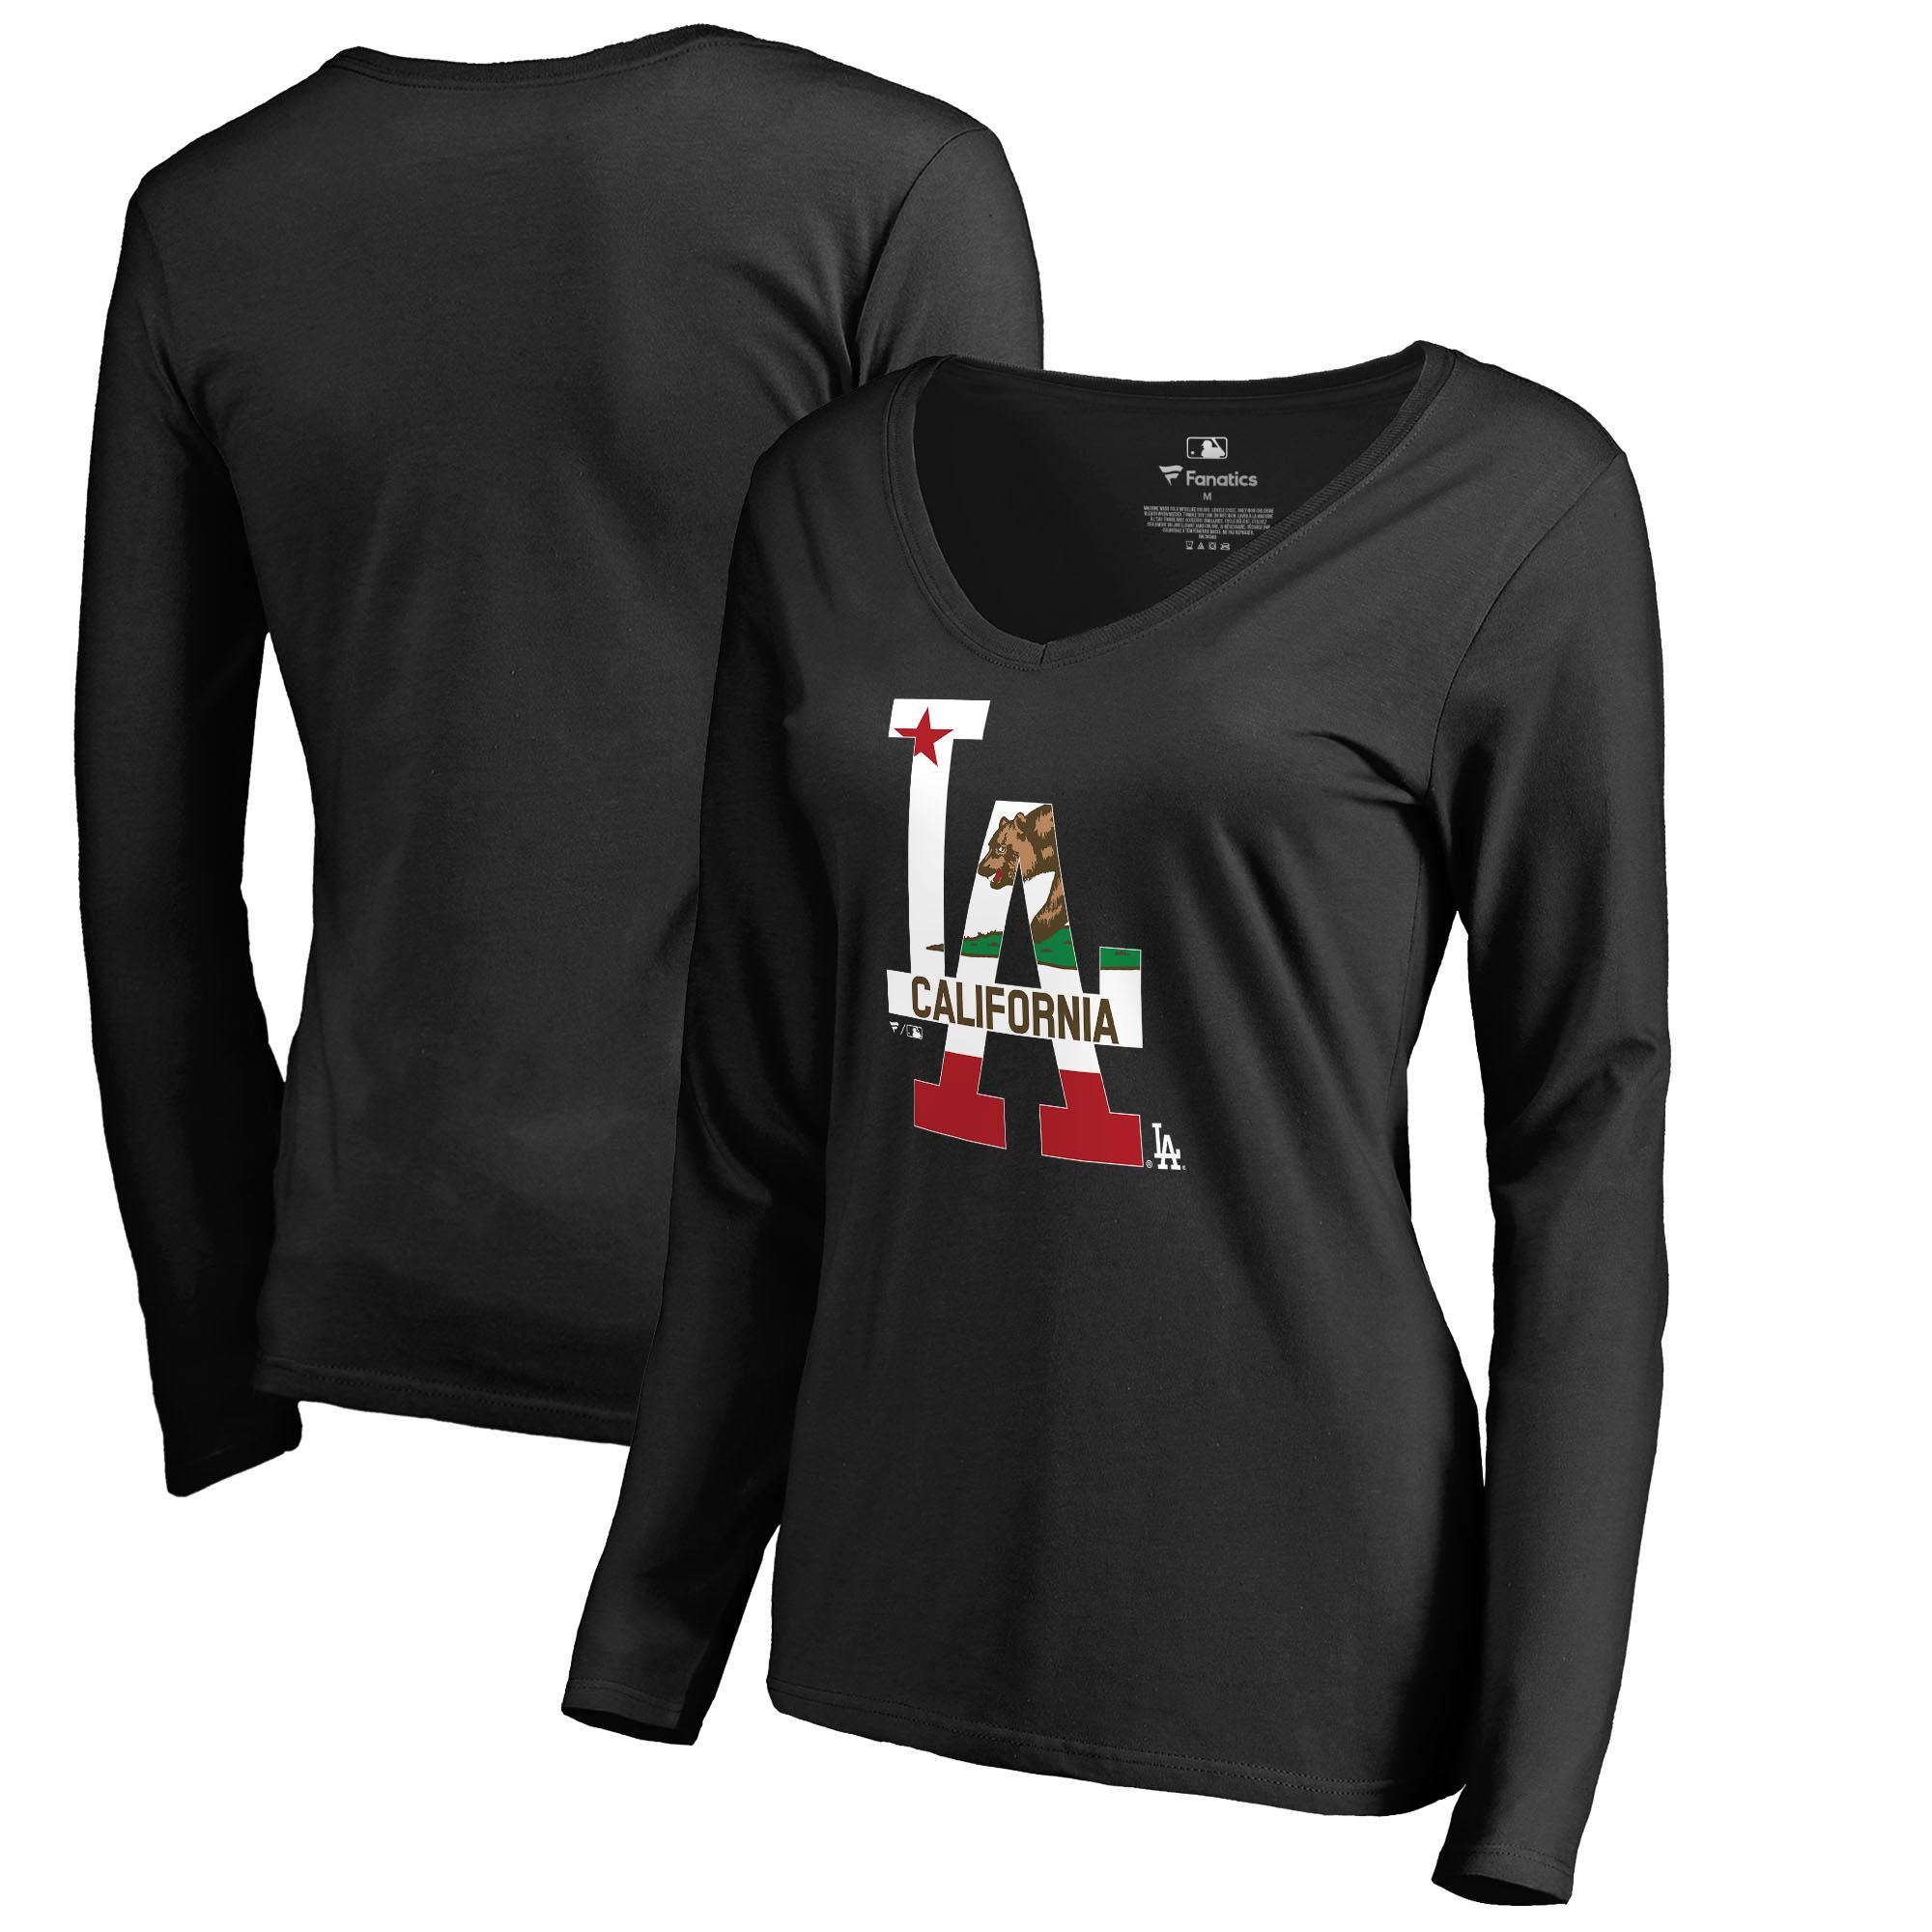 Los Angeles Dodgers Fanatics Branded Women's Hometown Collection Cali Flag Long Sleeve V-Neck T-Shirt - Black